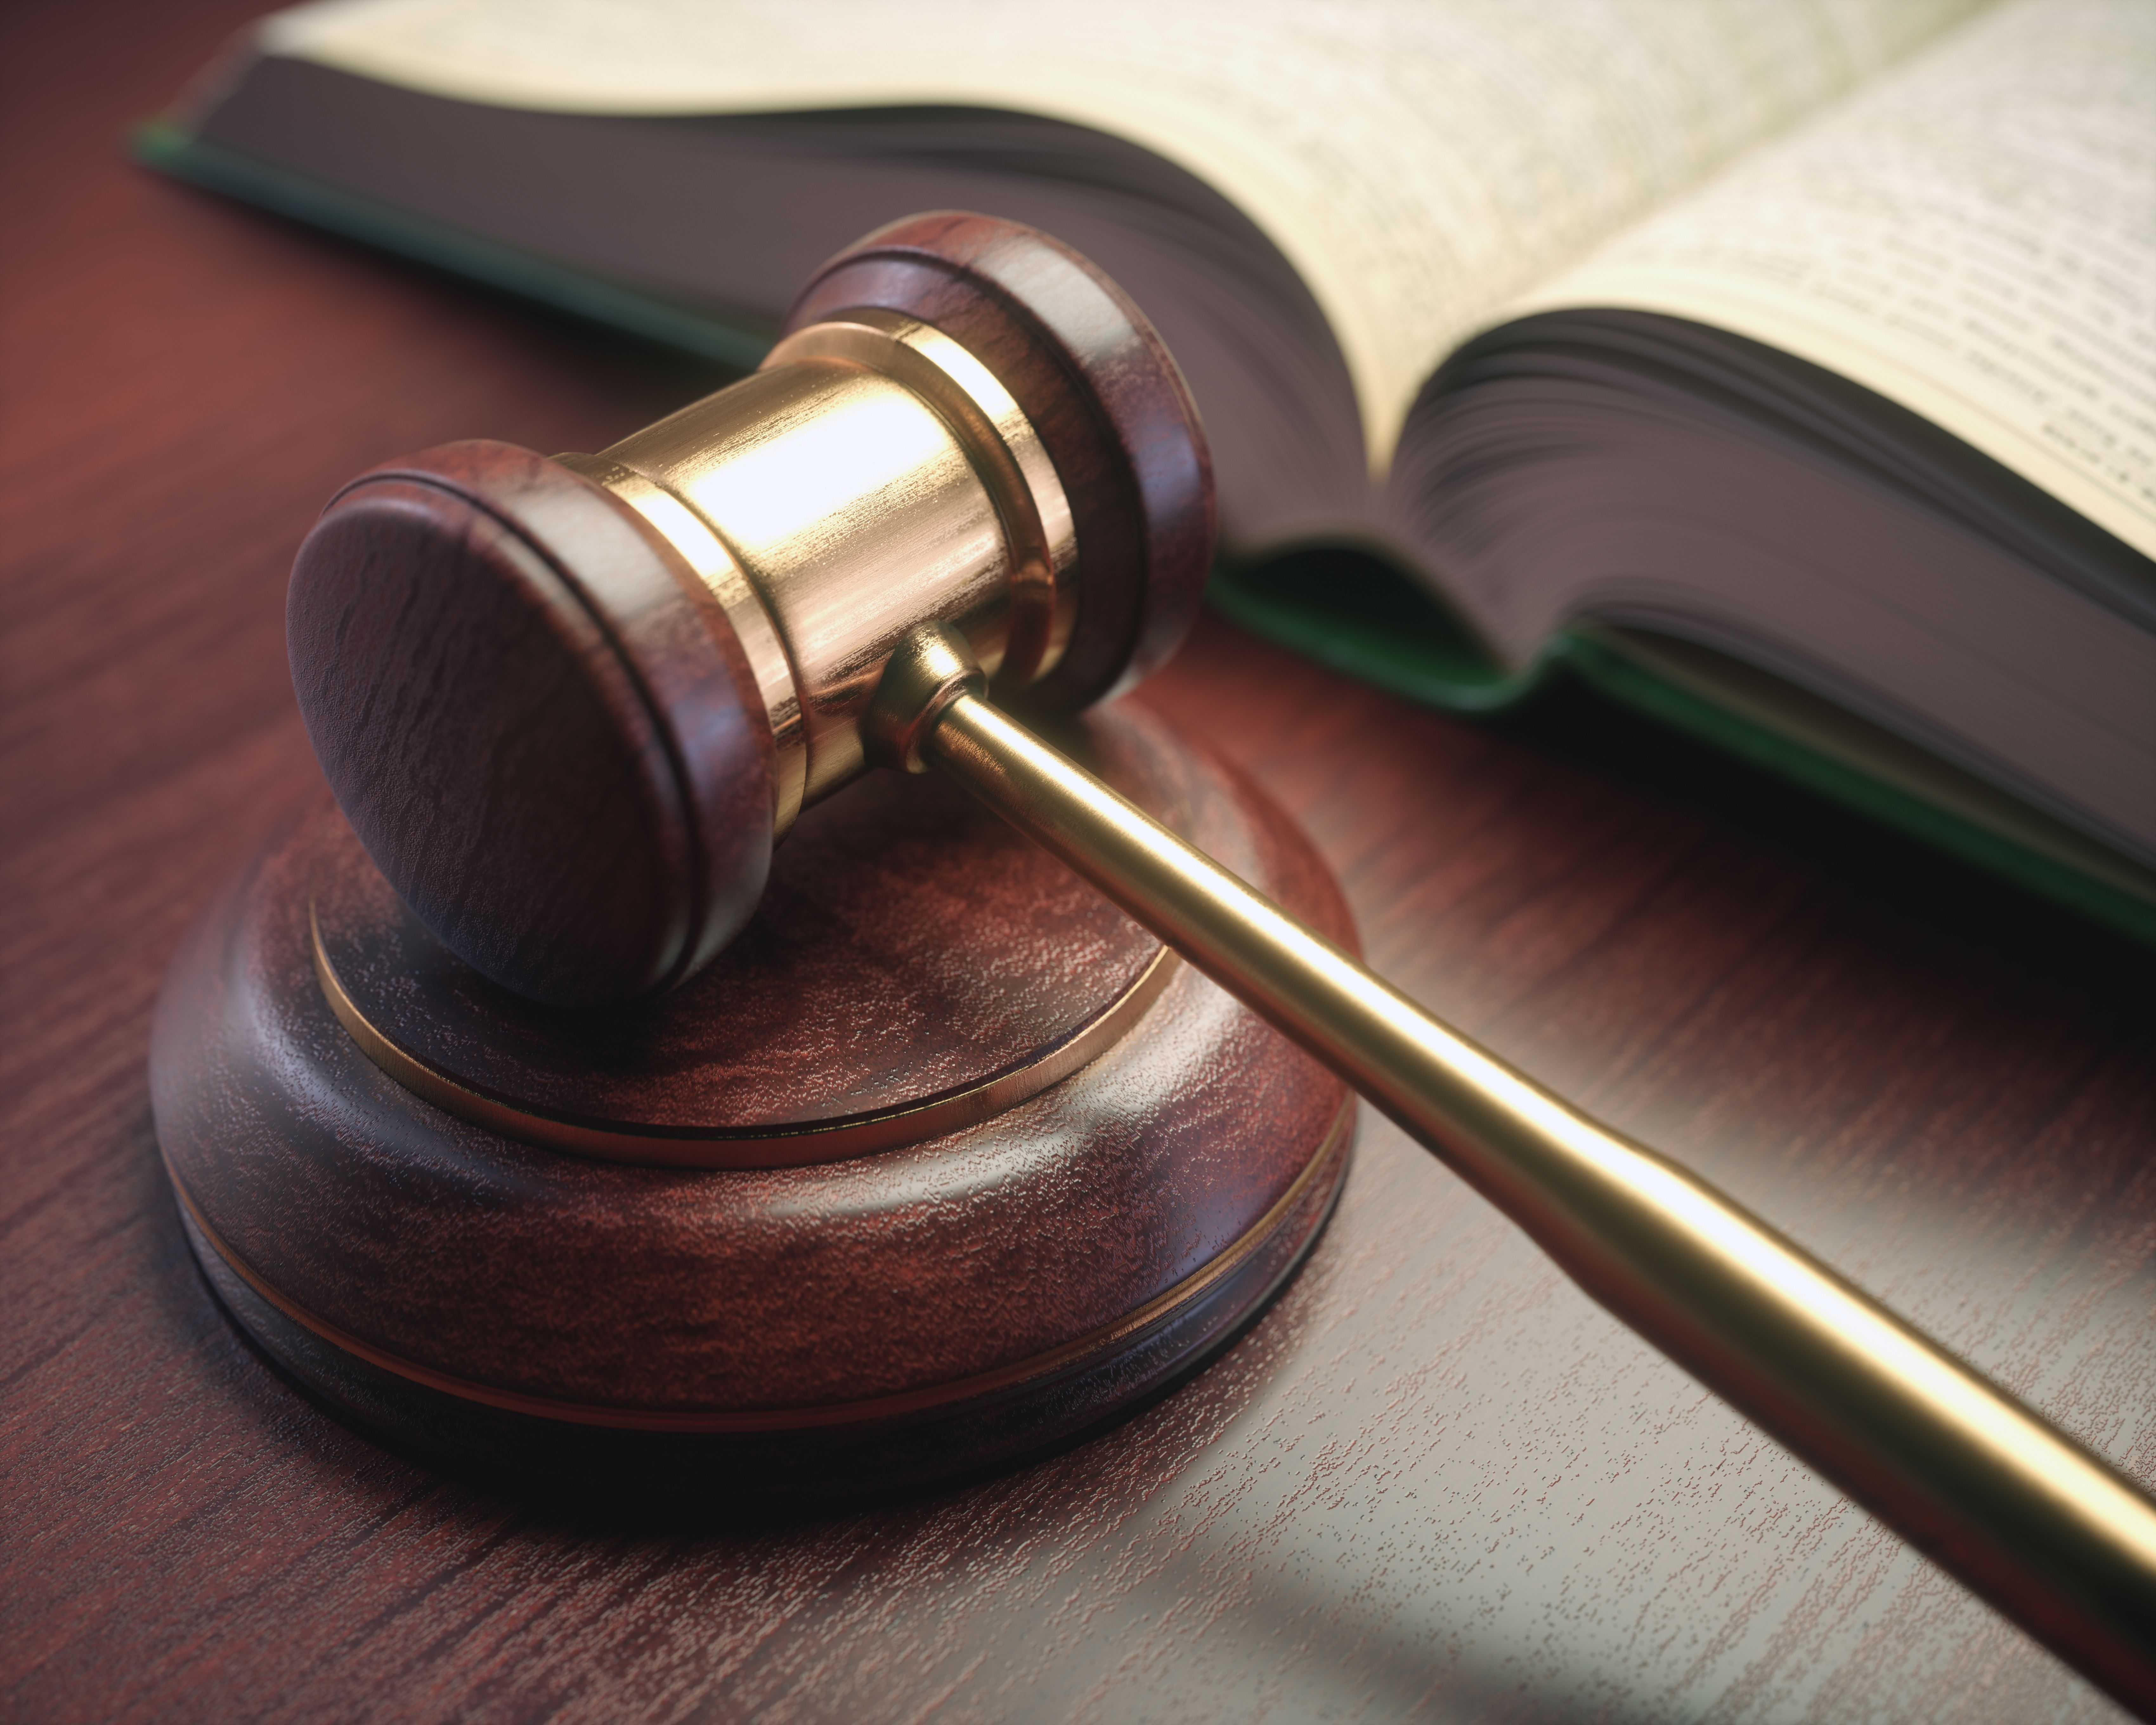 Wooden judge hammer with golden details and a legislation book beside